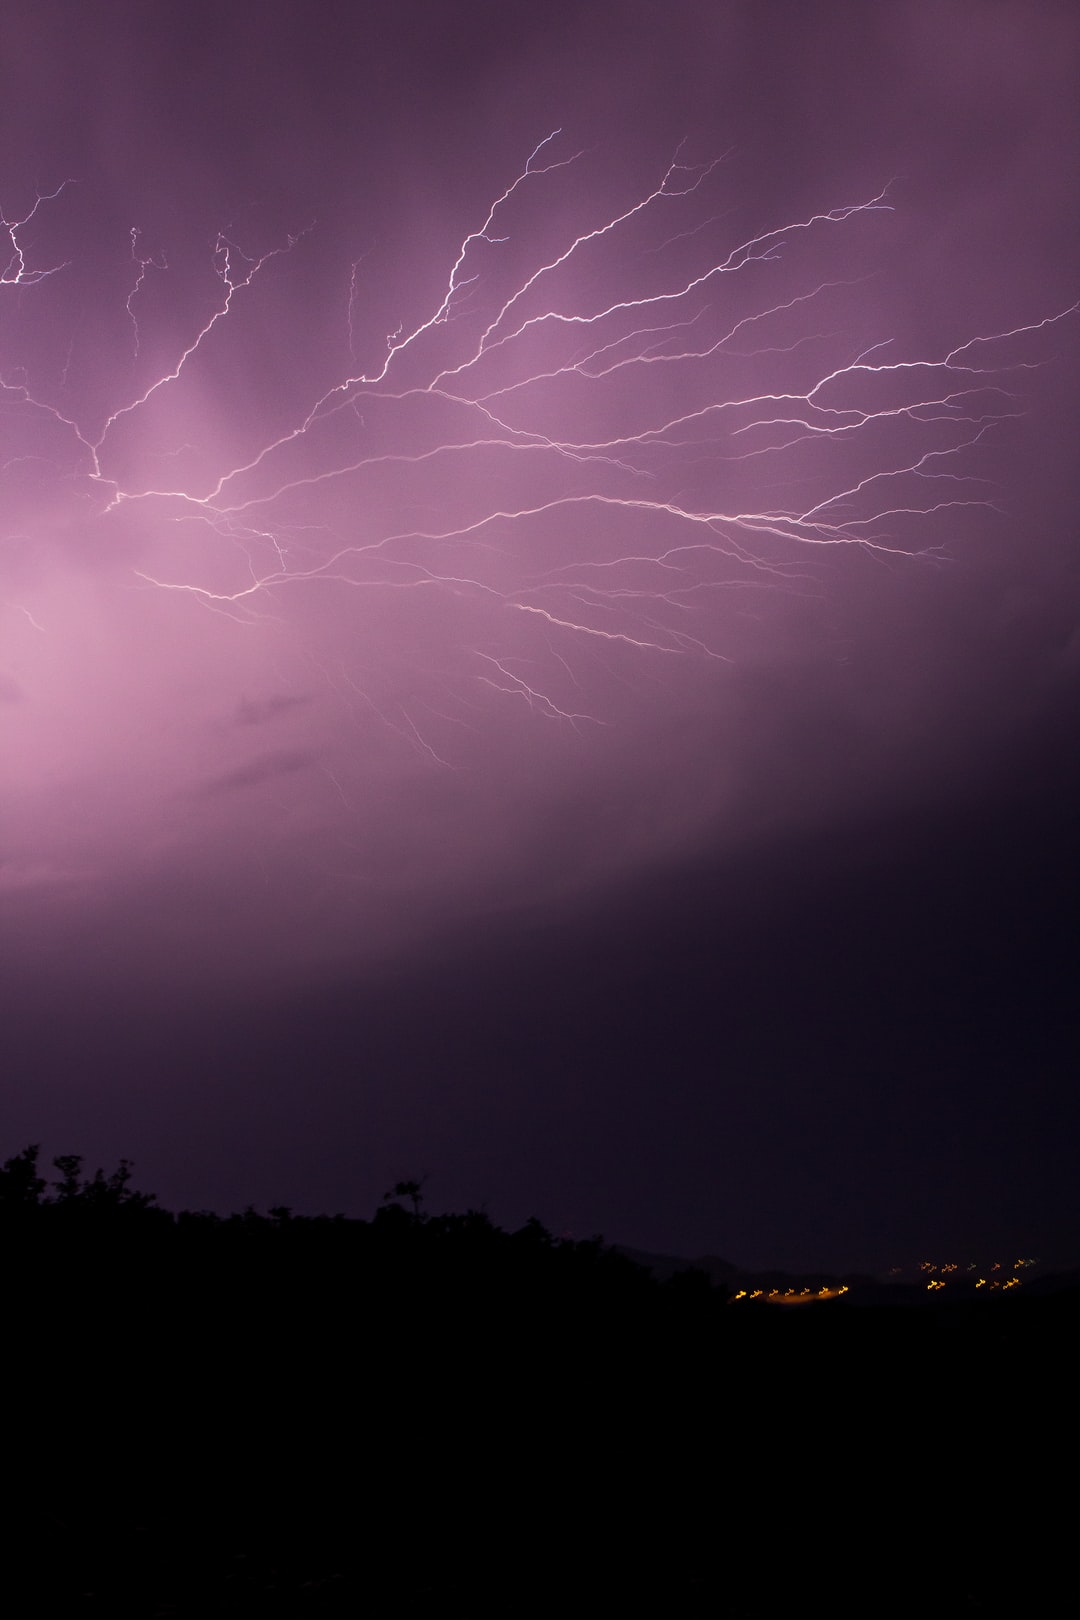 Insane lightening storm, taken in Slime, Croatia.